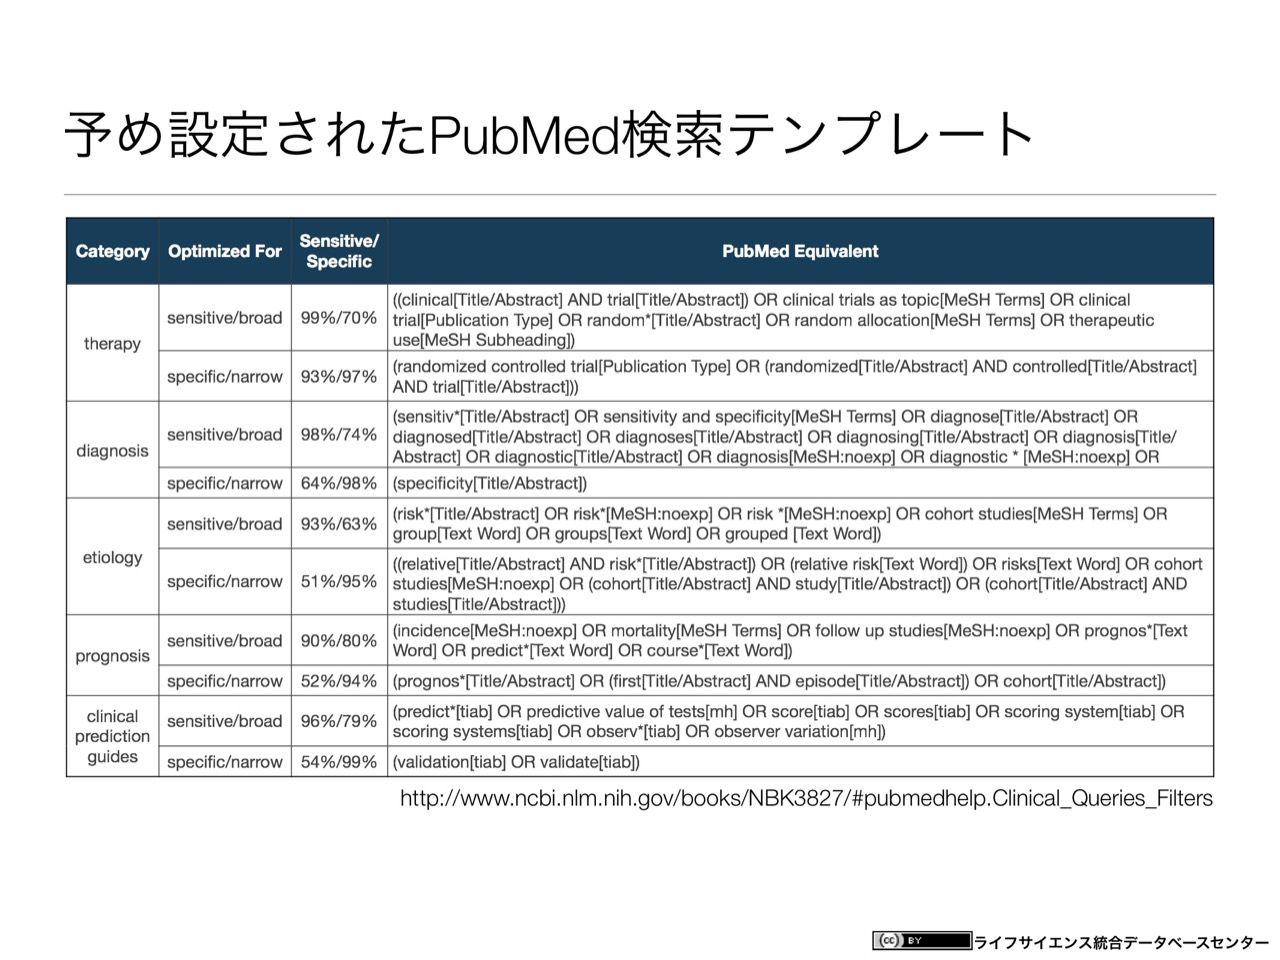 images/AJACS60_yamamoto_025.jpg